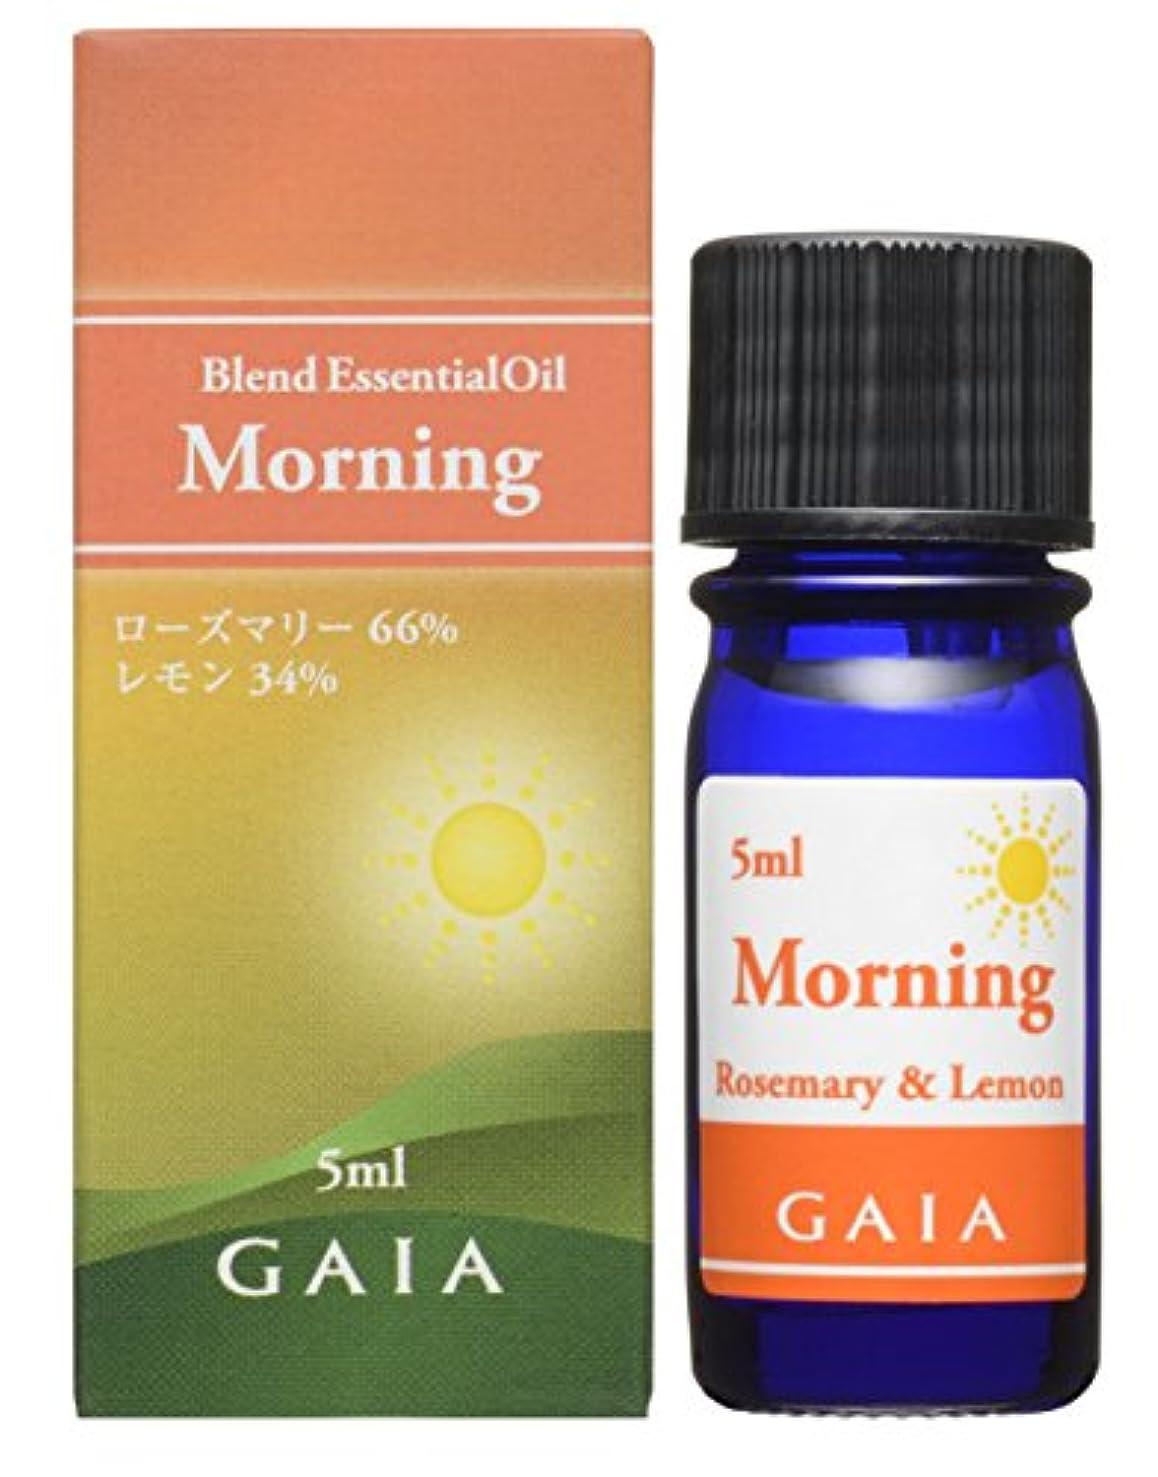 GAIA (ガイア) ブレンドエッセンシャルオイル 朝 5ml 【AEAJ認定精油】